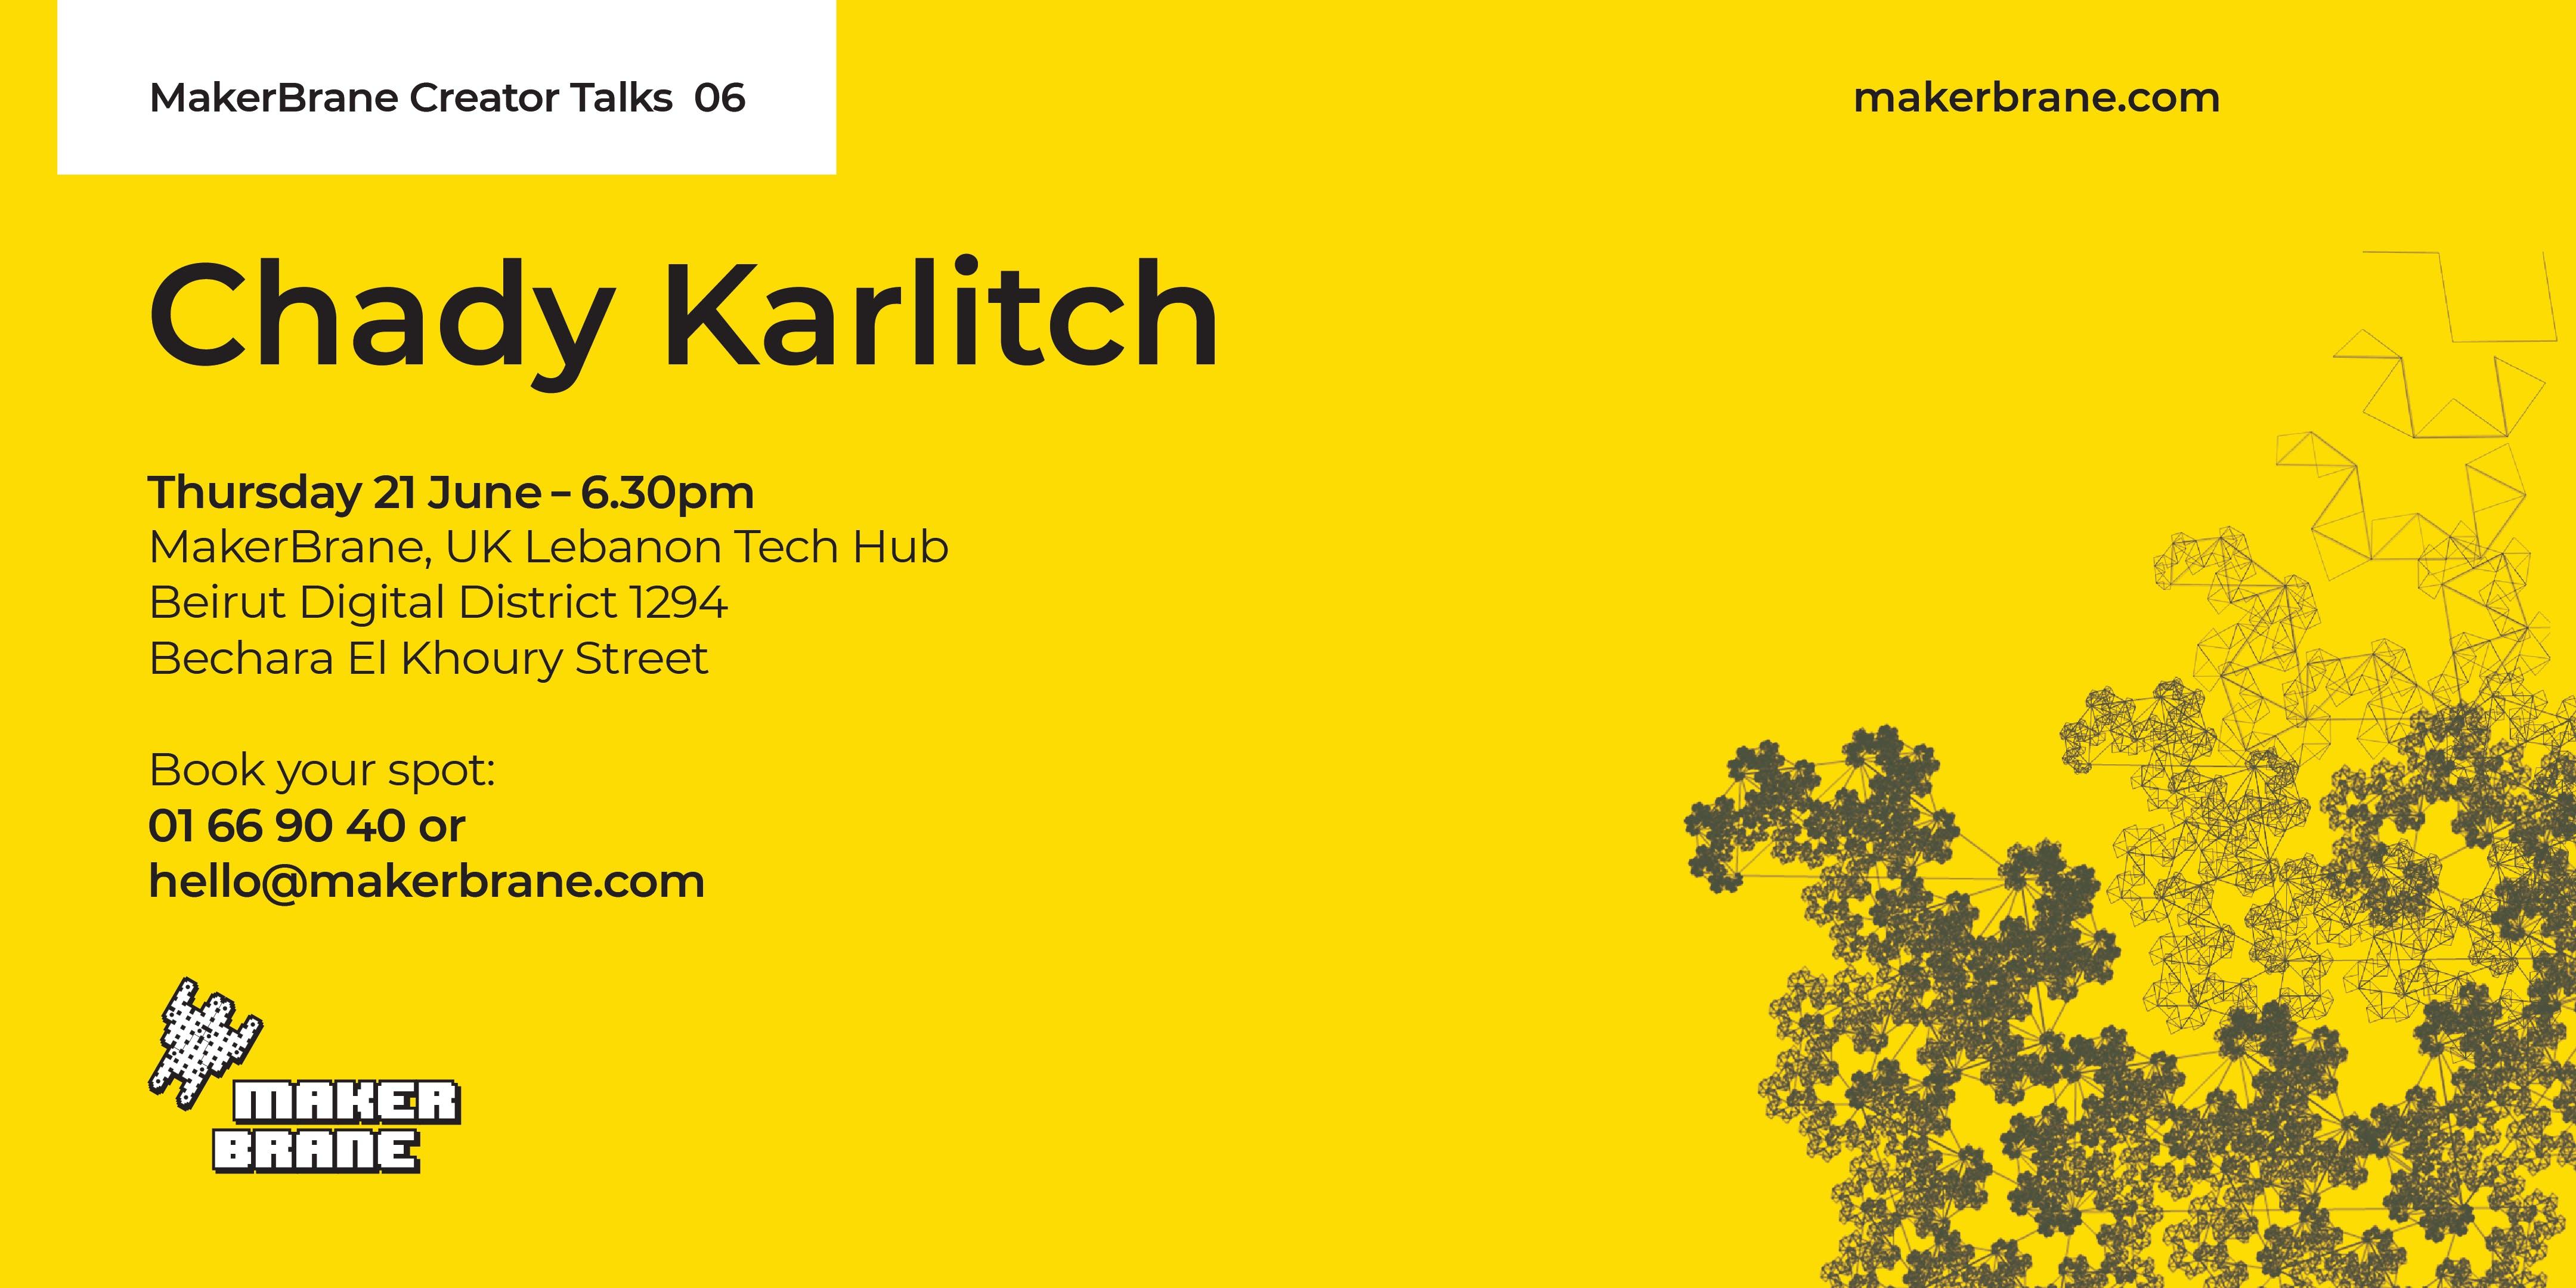 MakerBrane Creator Talk 6